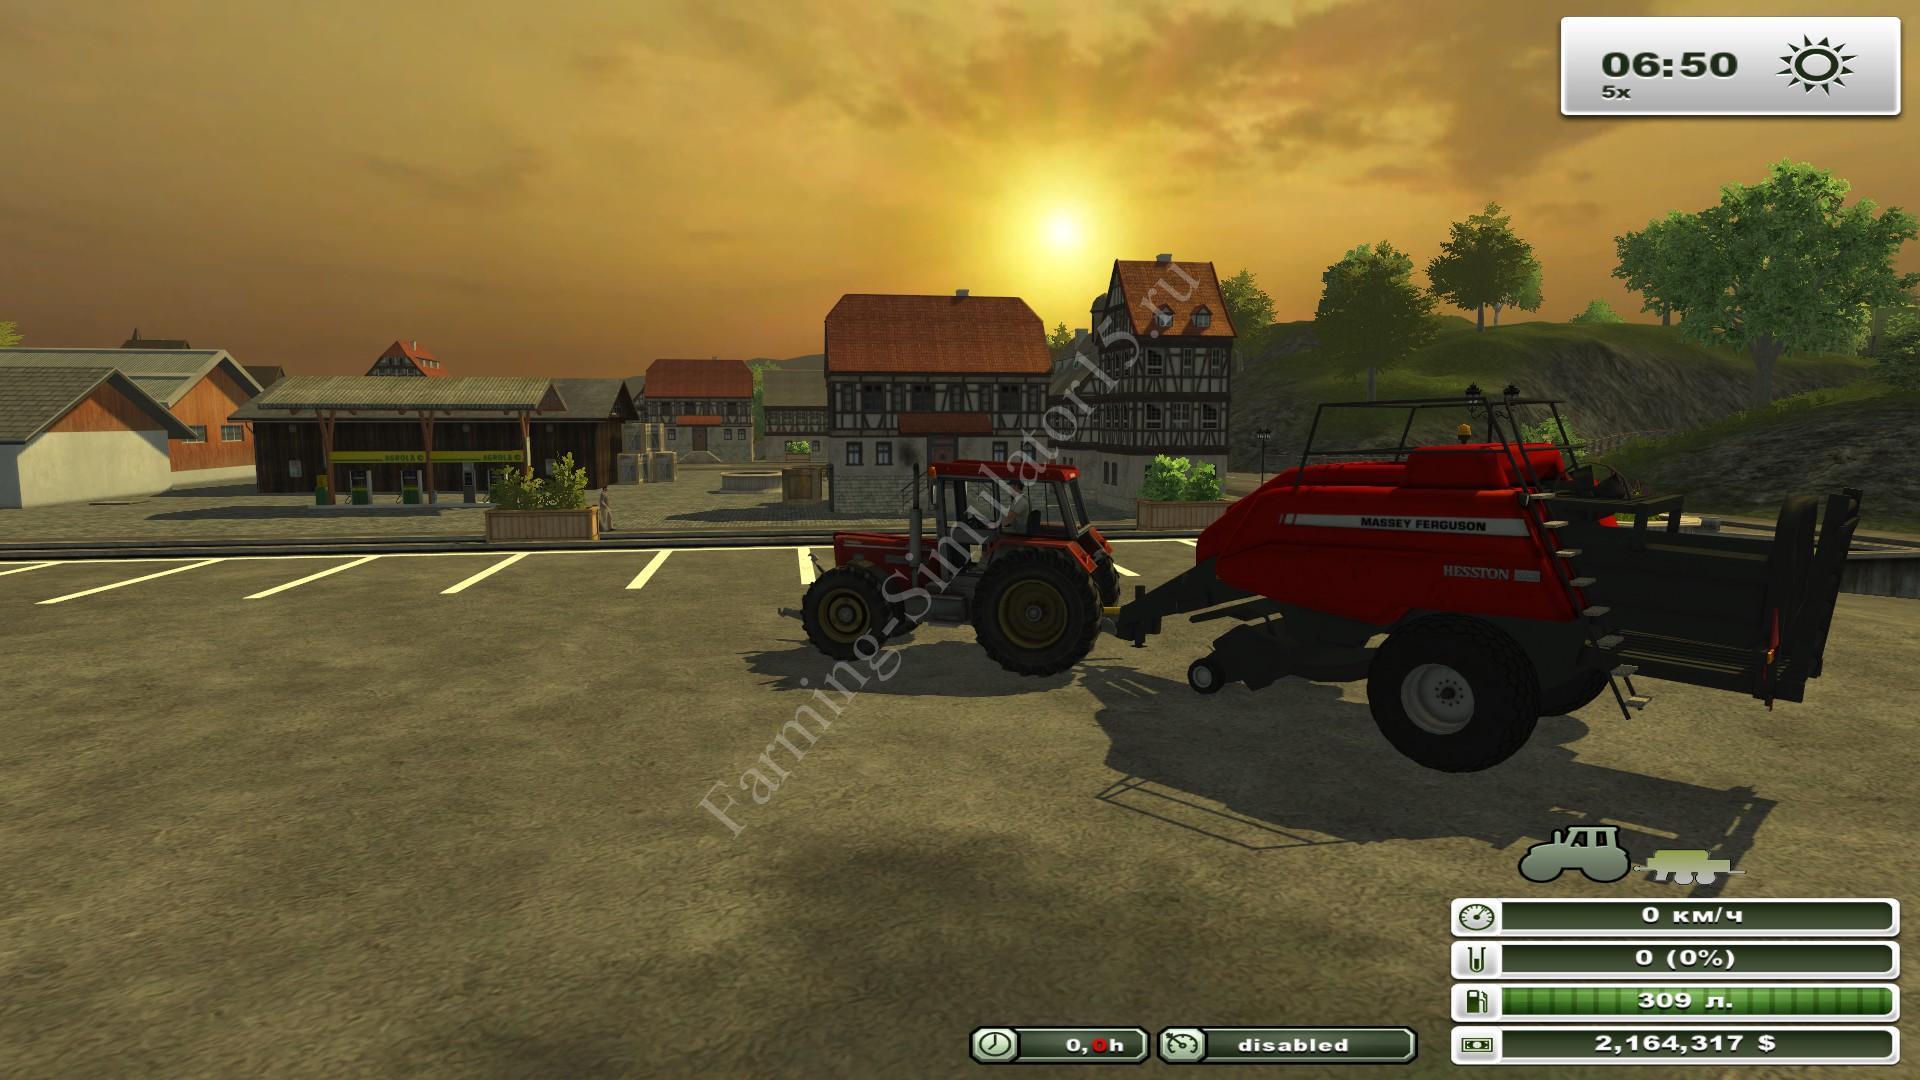 Massey Ferguson 2190 BB v 3.0 - мод тюкопресса Farming Simulator 13, Farming Simulator 2013